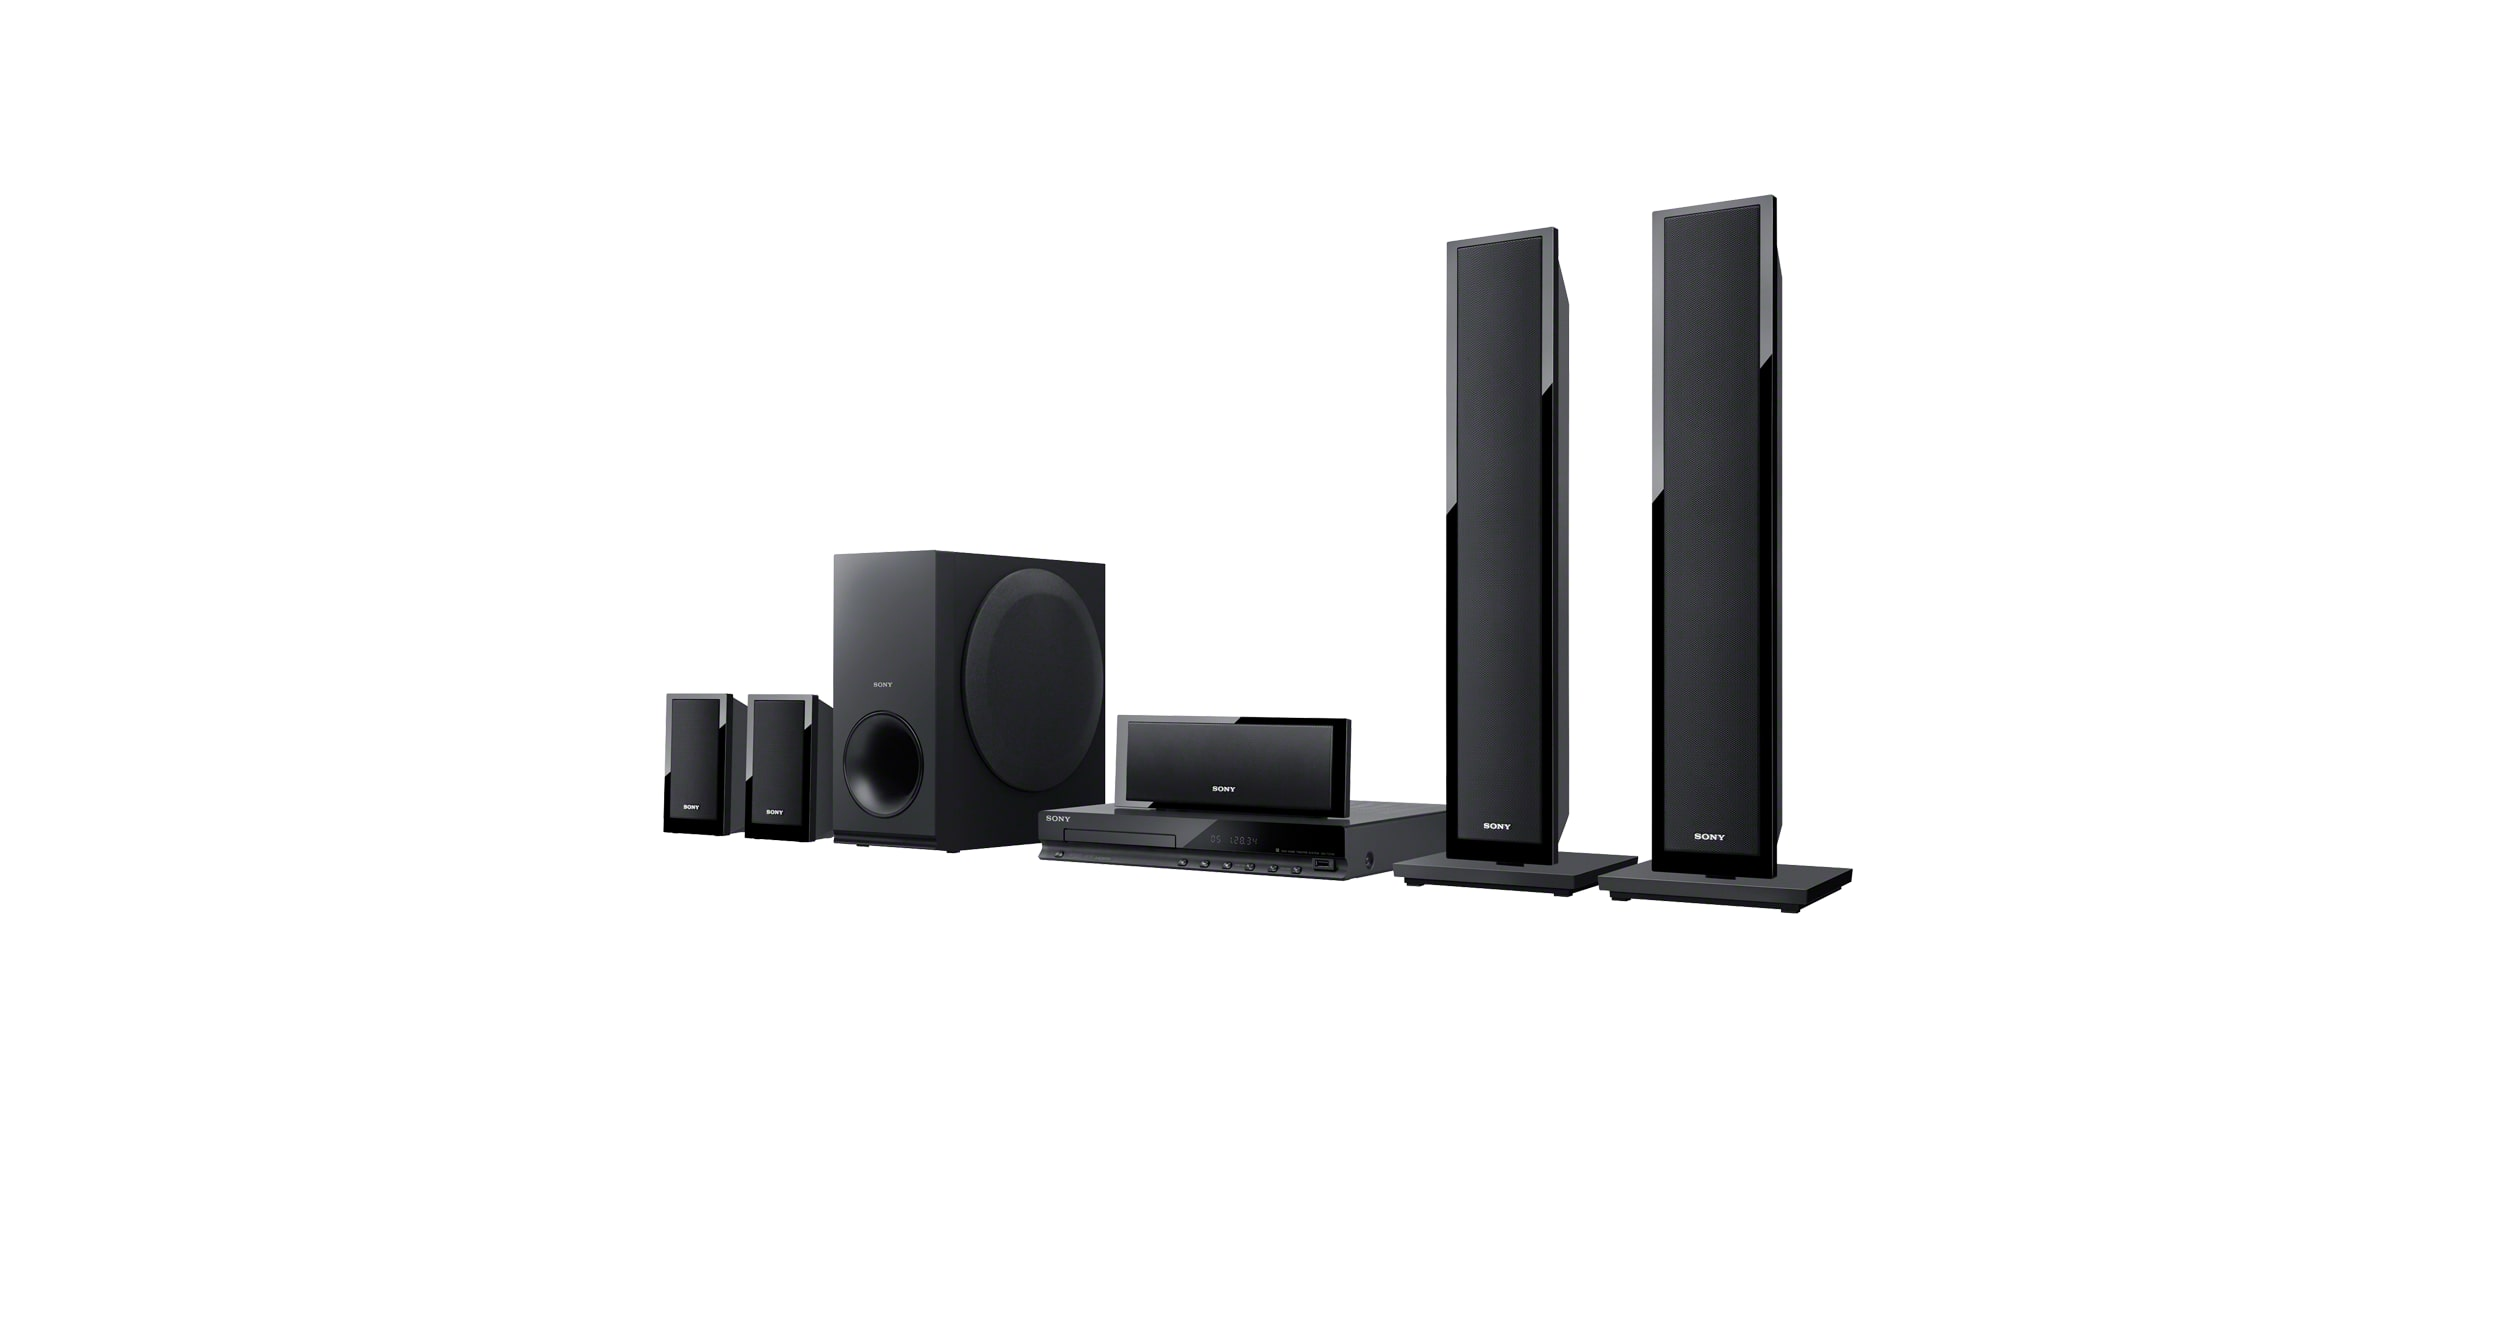 DVD Home Cinema System | DAV-TZ150 | Sony Asia Pacific